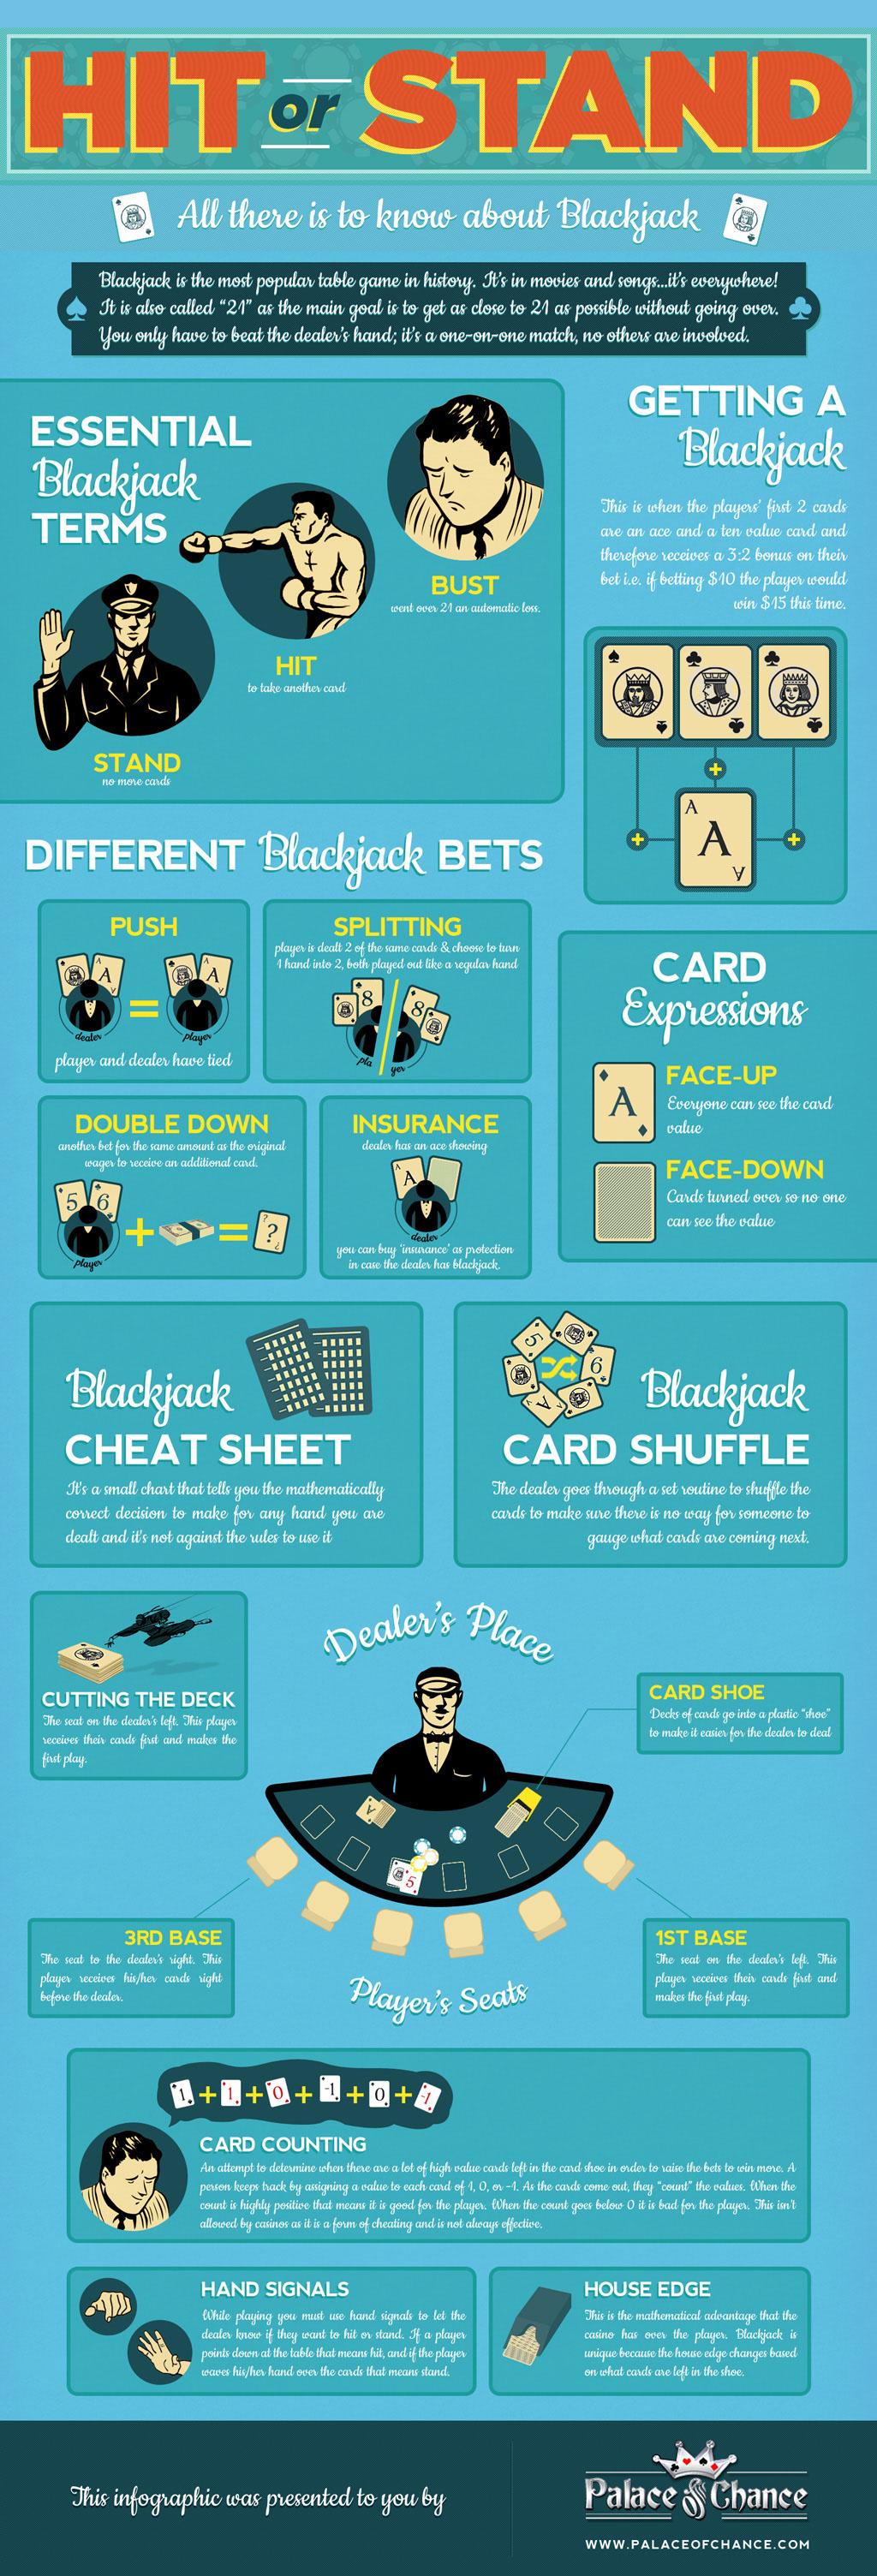 Blackjack 101-Infographic